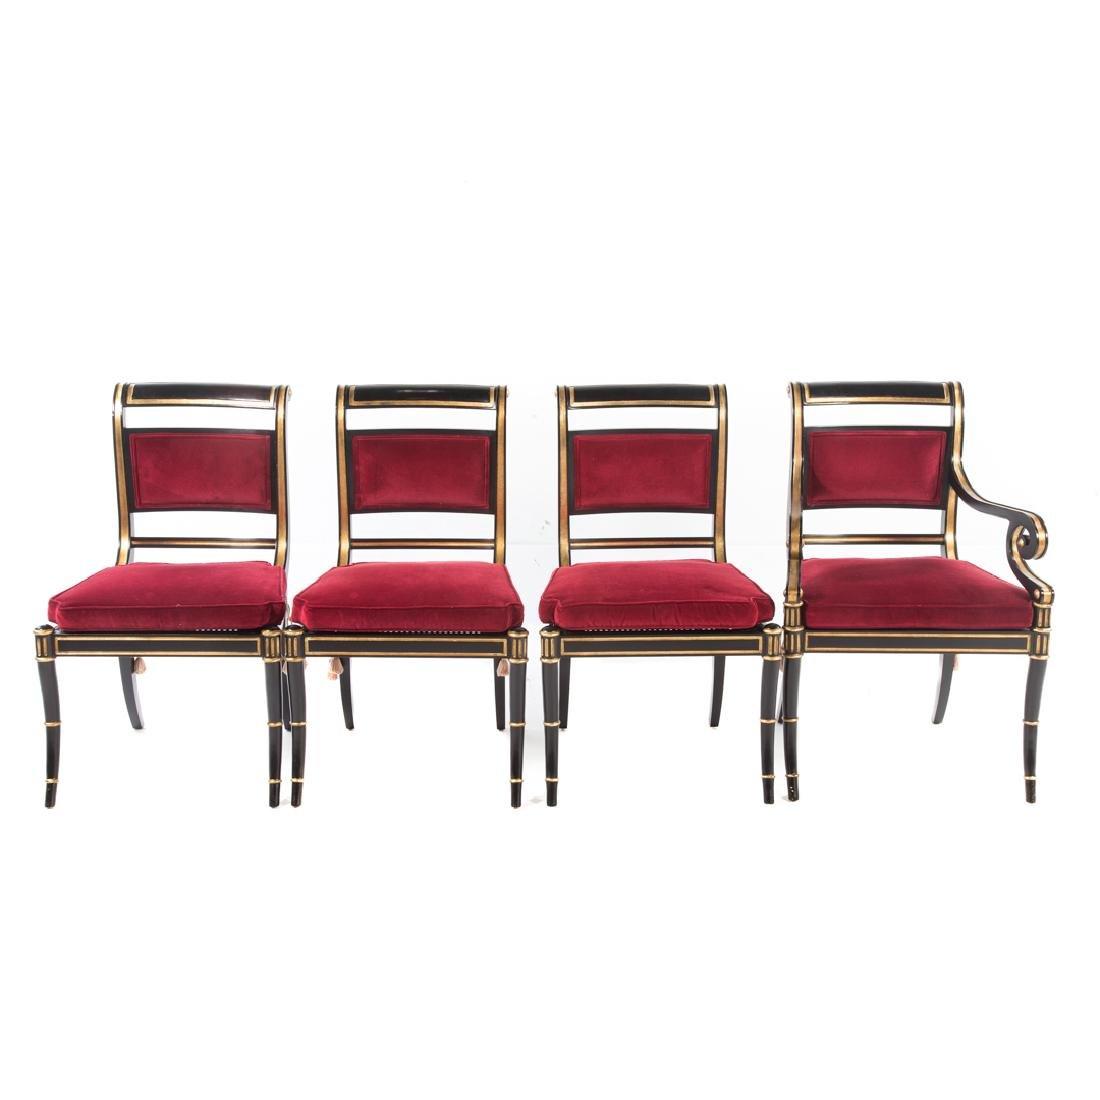 10 Baker Regency style ebonized/gilt dining chairs - 2